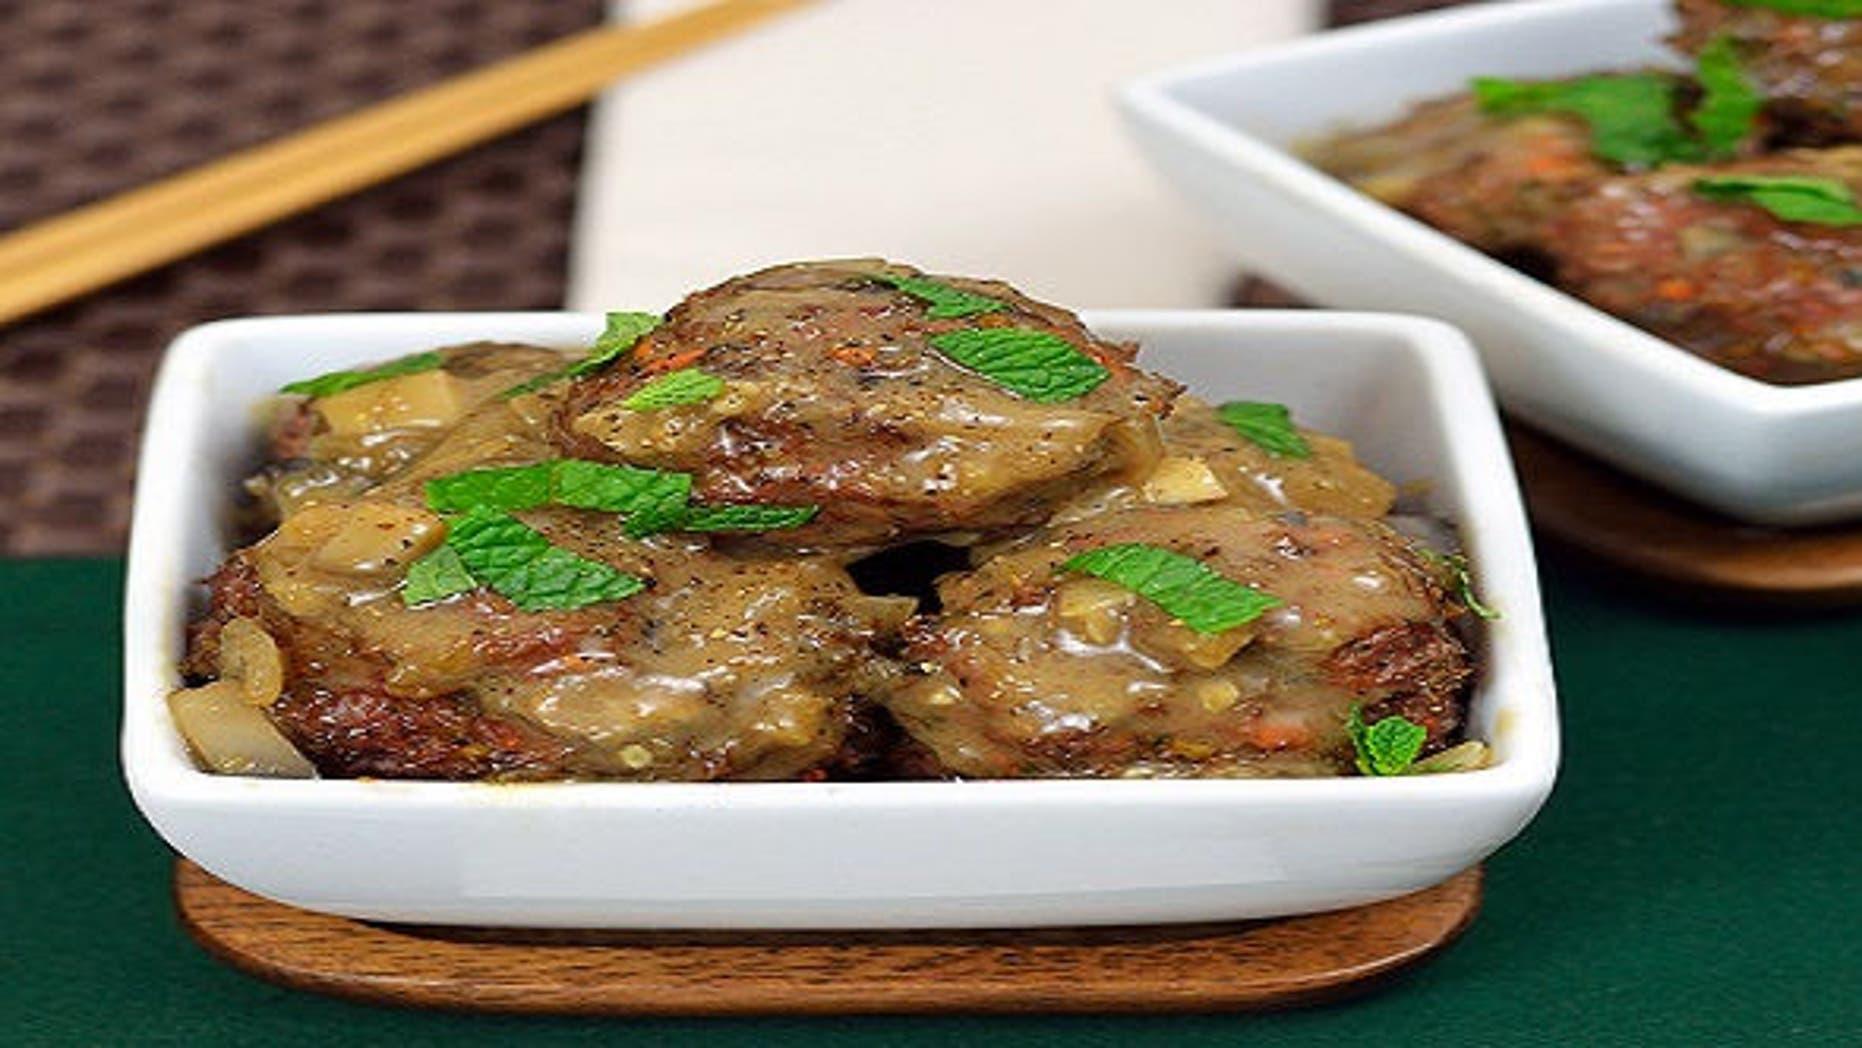 Lamb meatballs in a creamy mushroom sauce make a great pass-around appetizer.